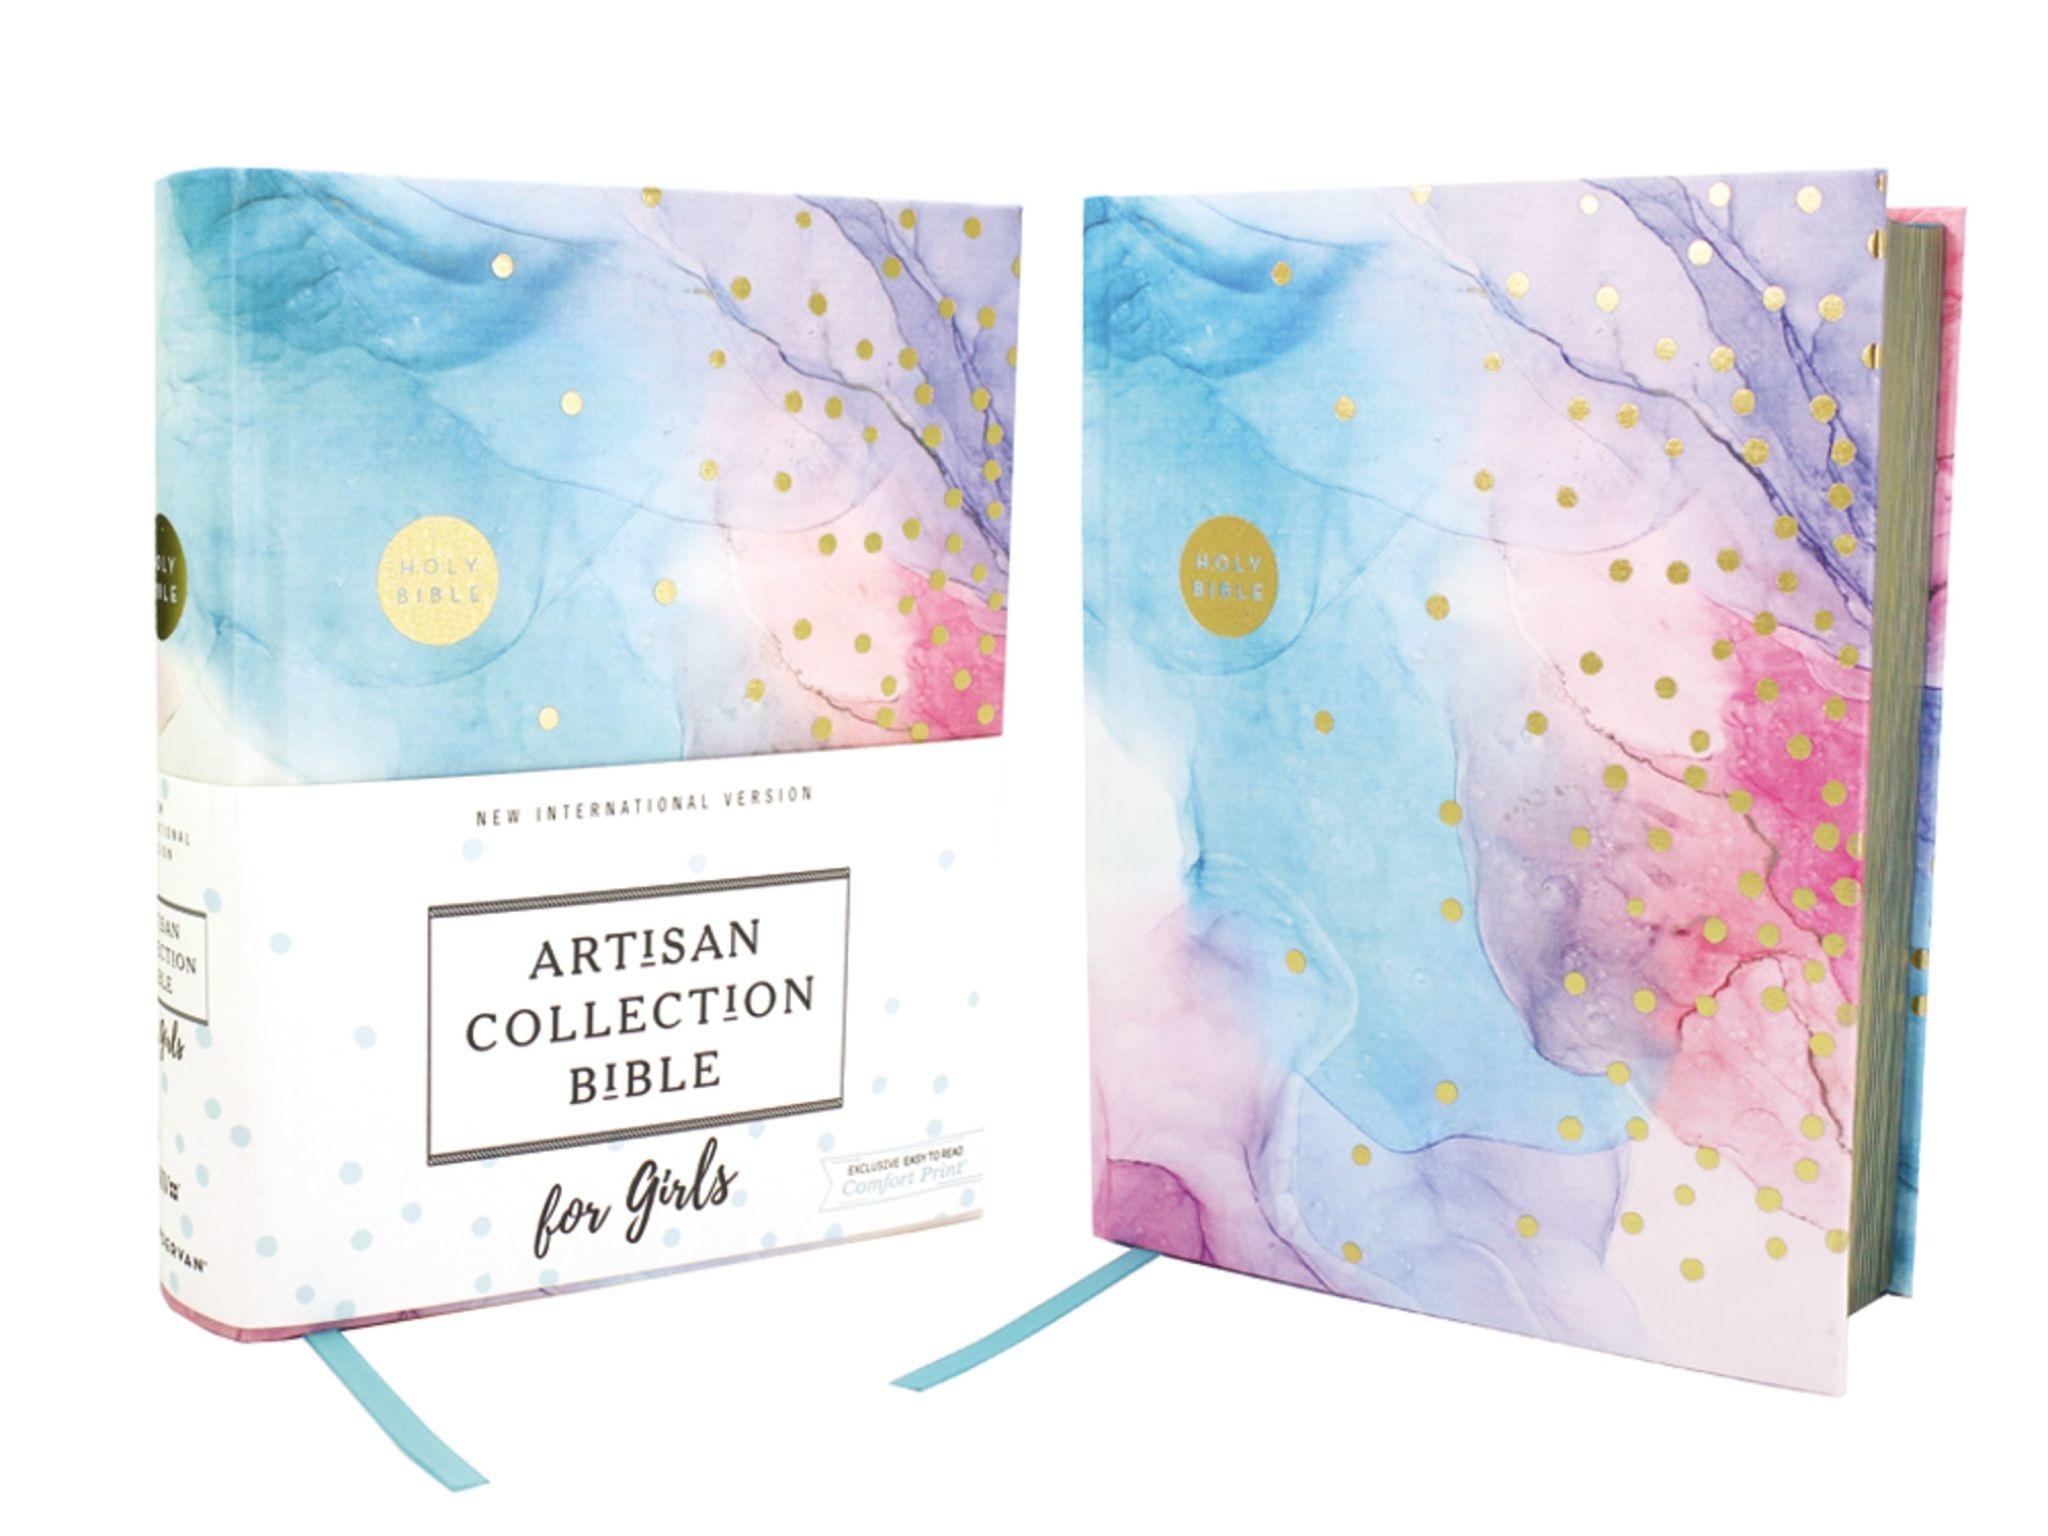 NIV Artisan Collection Bible for Girls - Multi Color